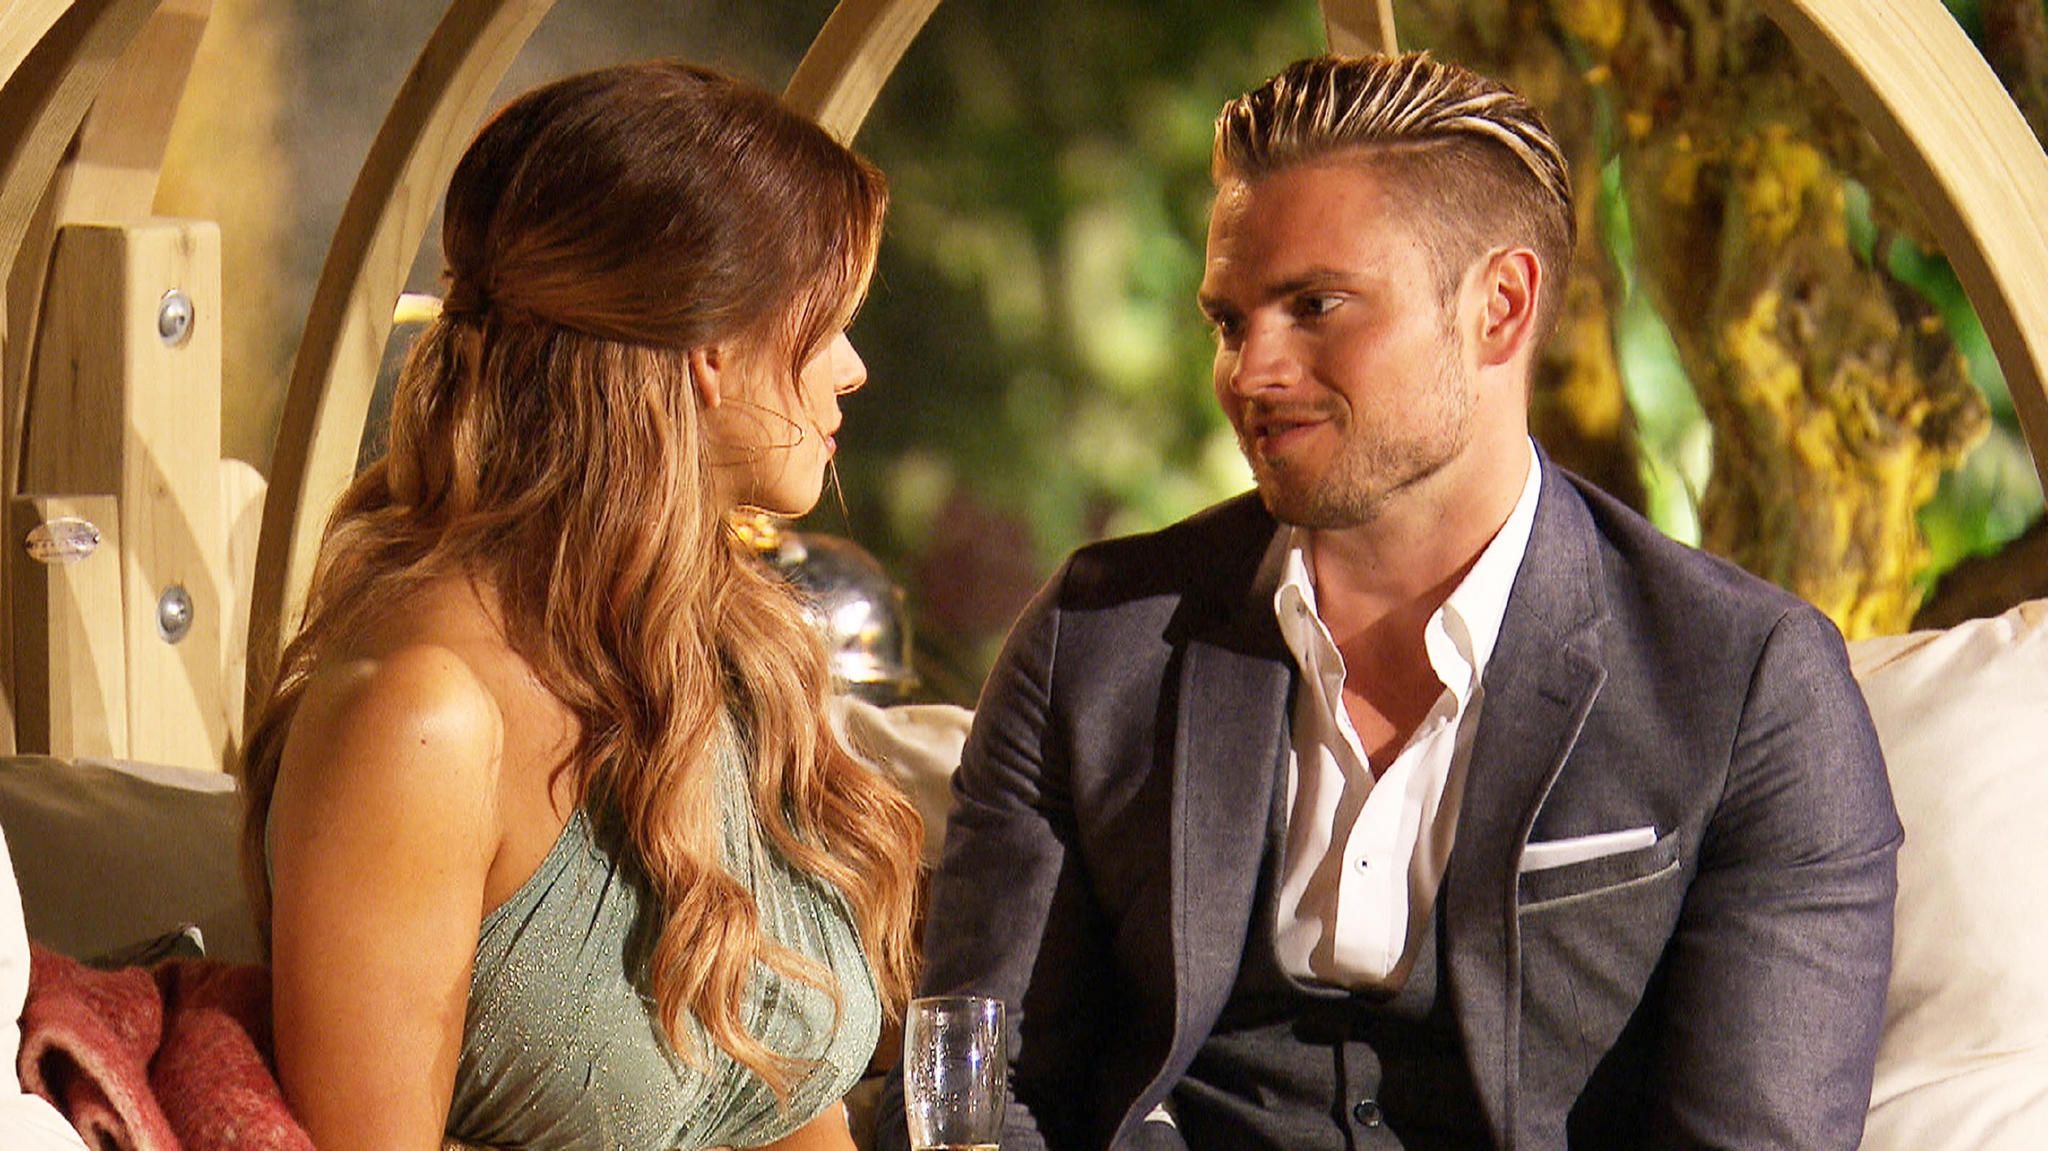 Bachelorette Jessica und Johannes.